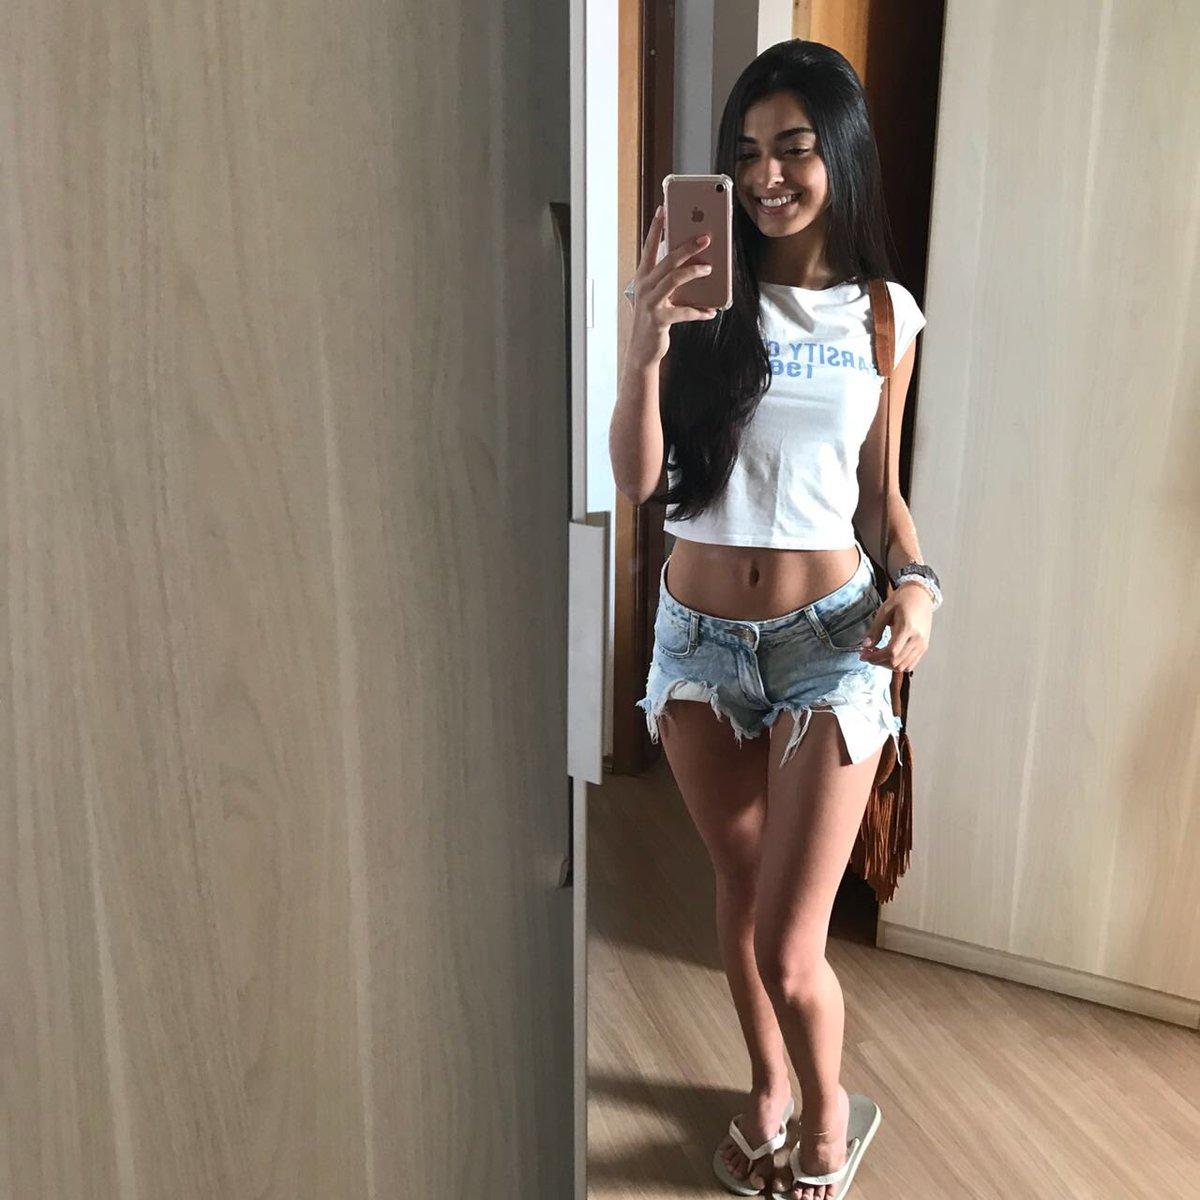 Selfie Paris Berelc nude (32 foto and video), Sexy, Fappening, Feet, braless 2020